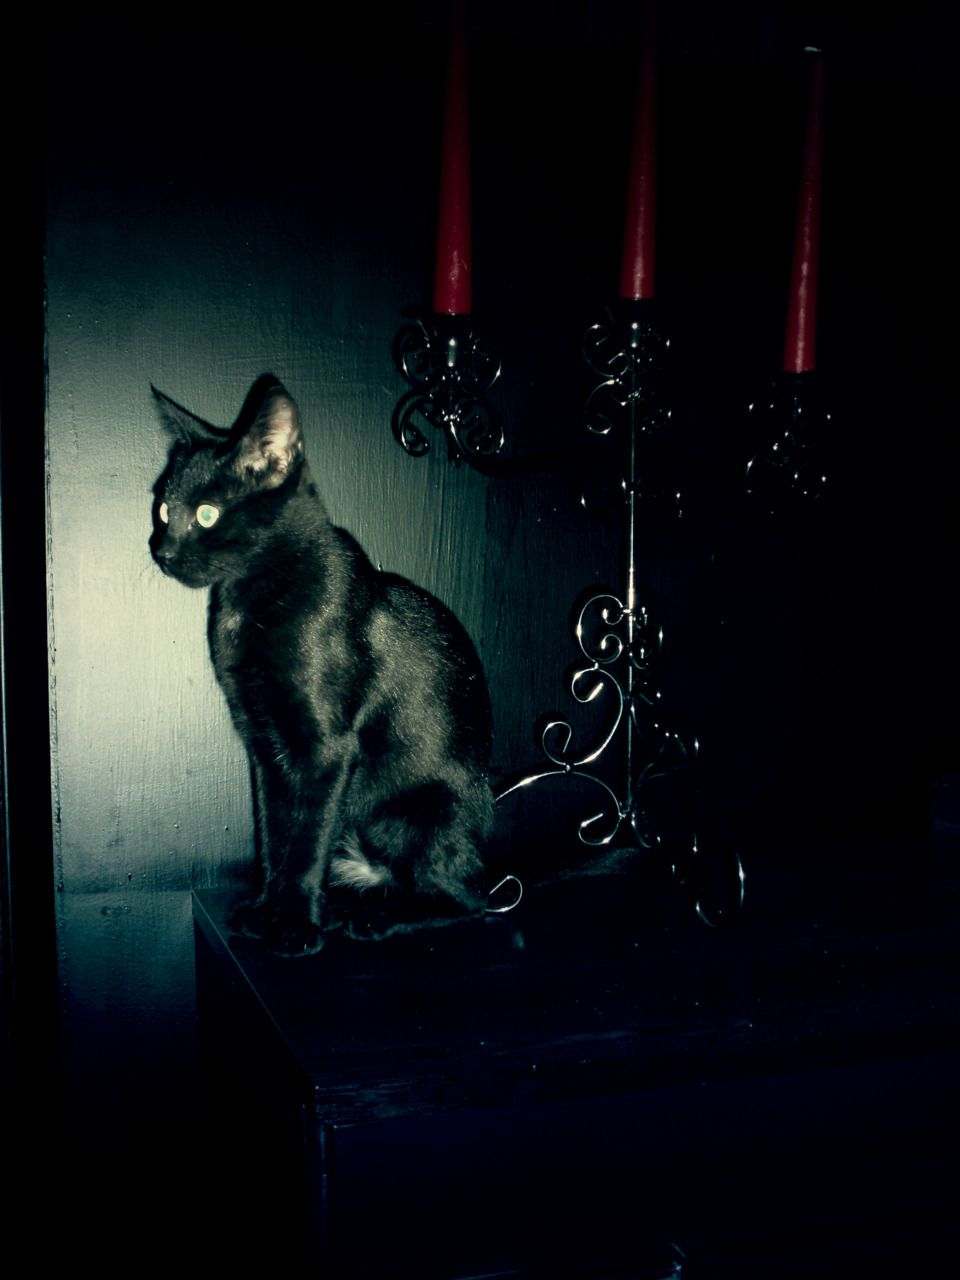 as kitten as a cat